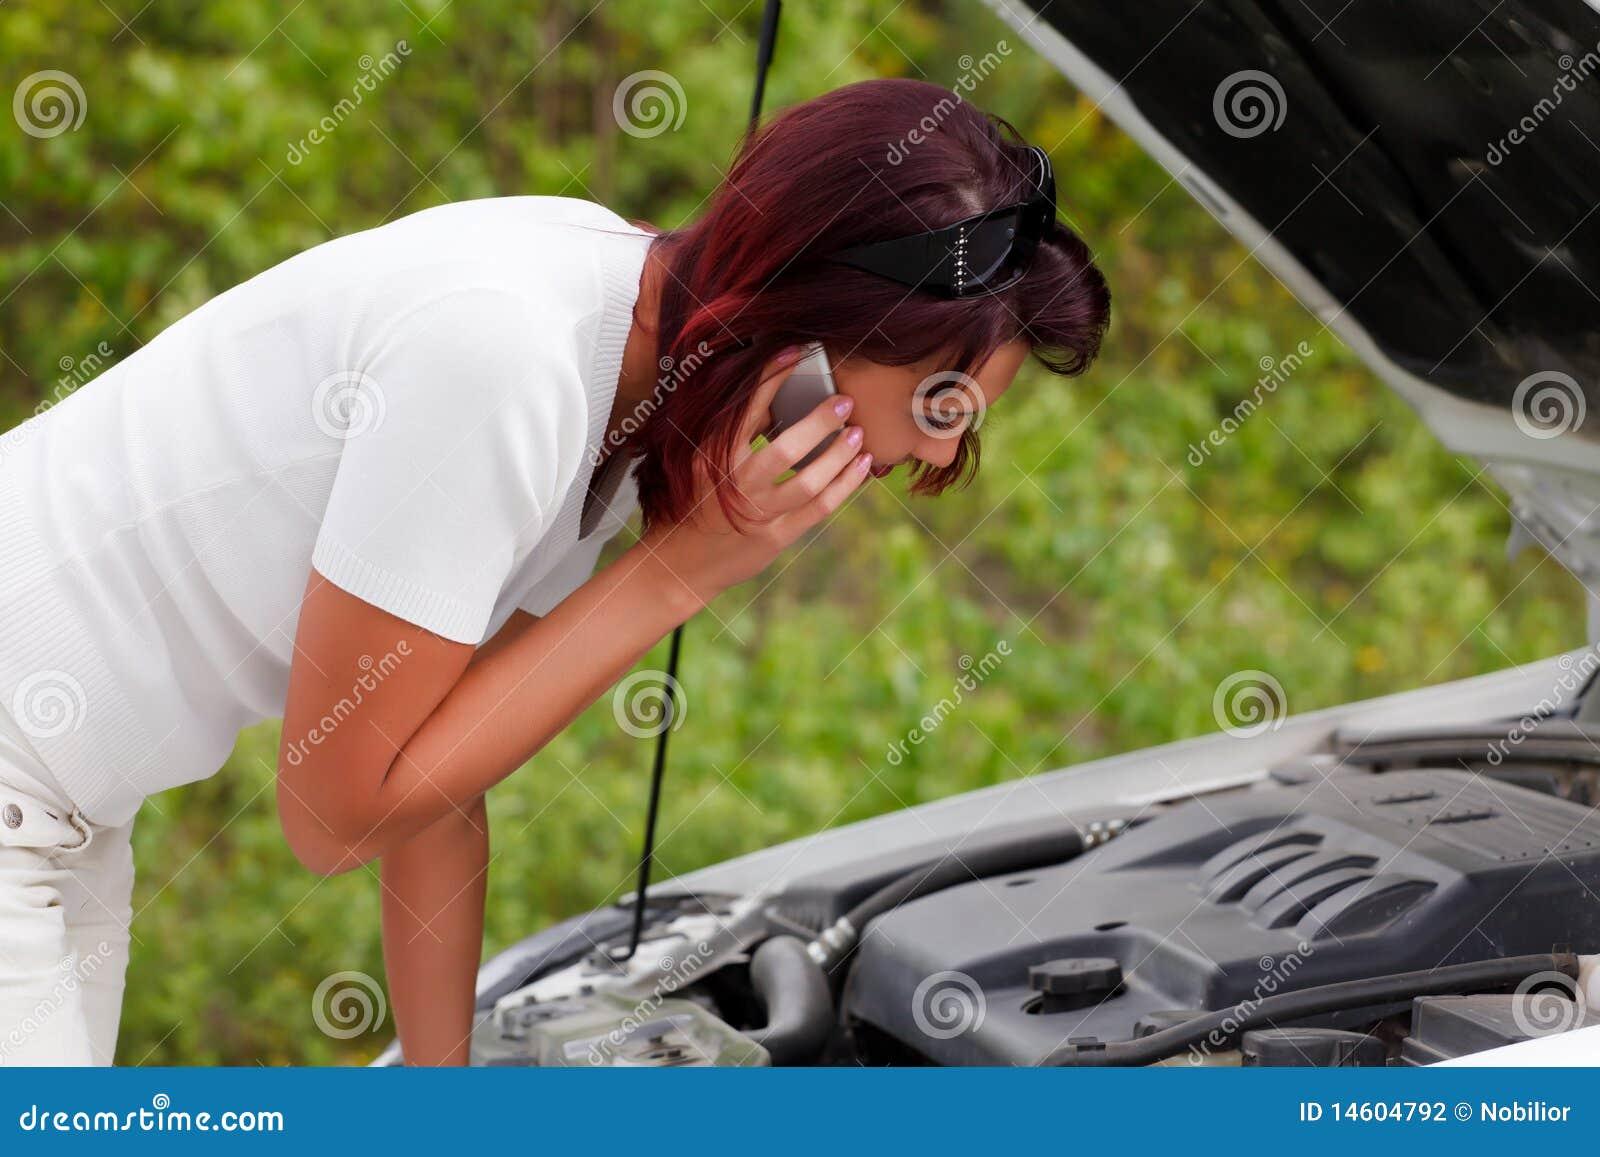 Awaria silnika